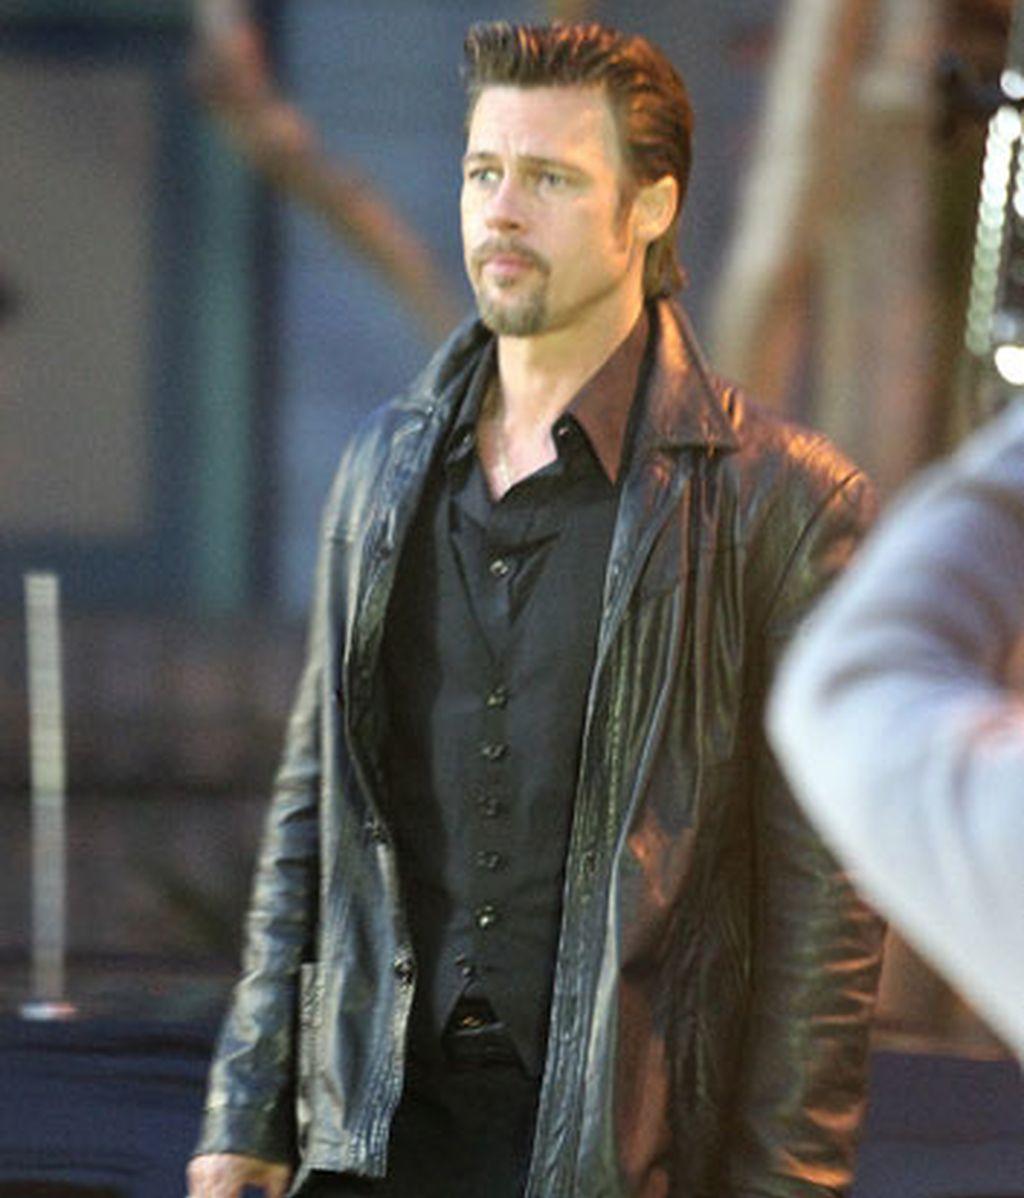 Brad Pitt = William Bradley Pitt